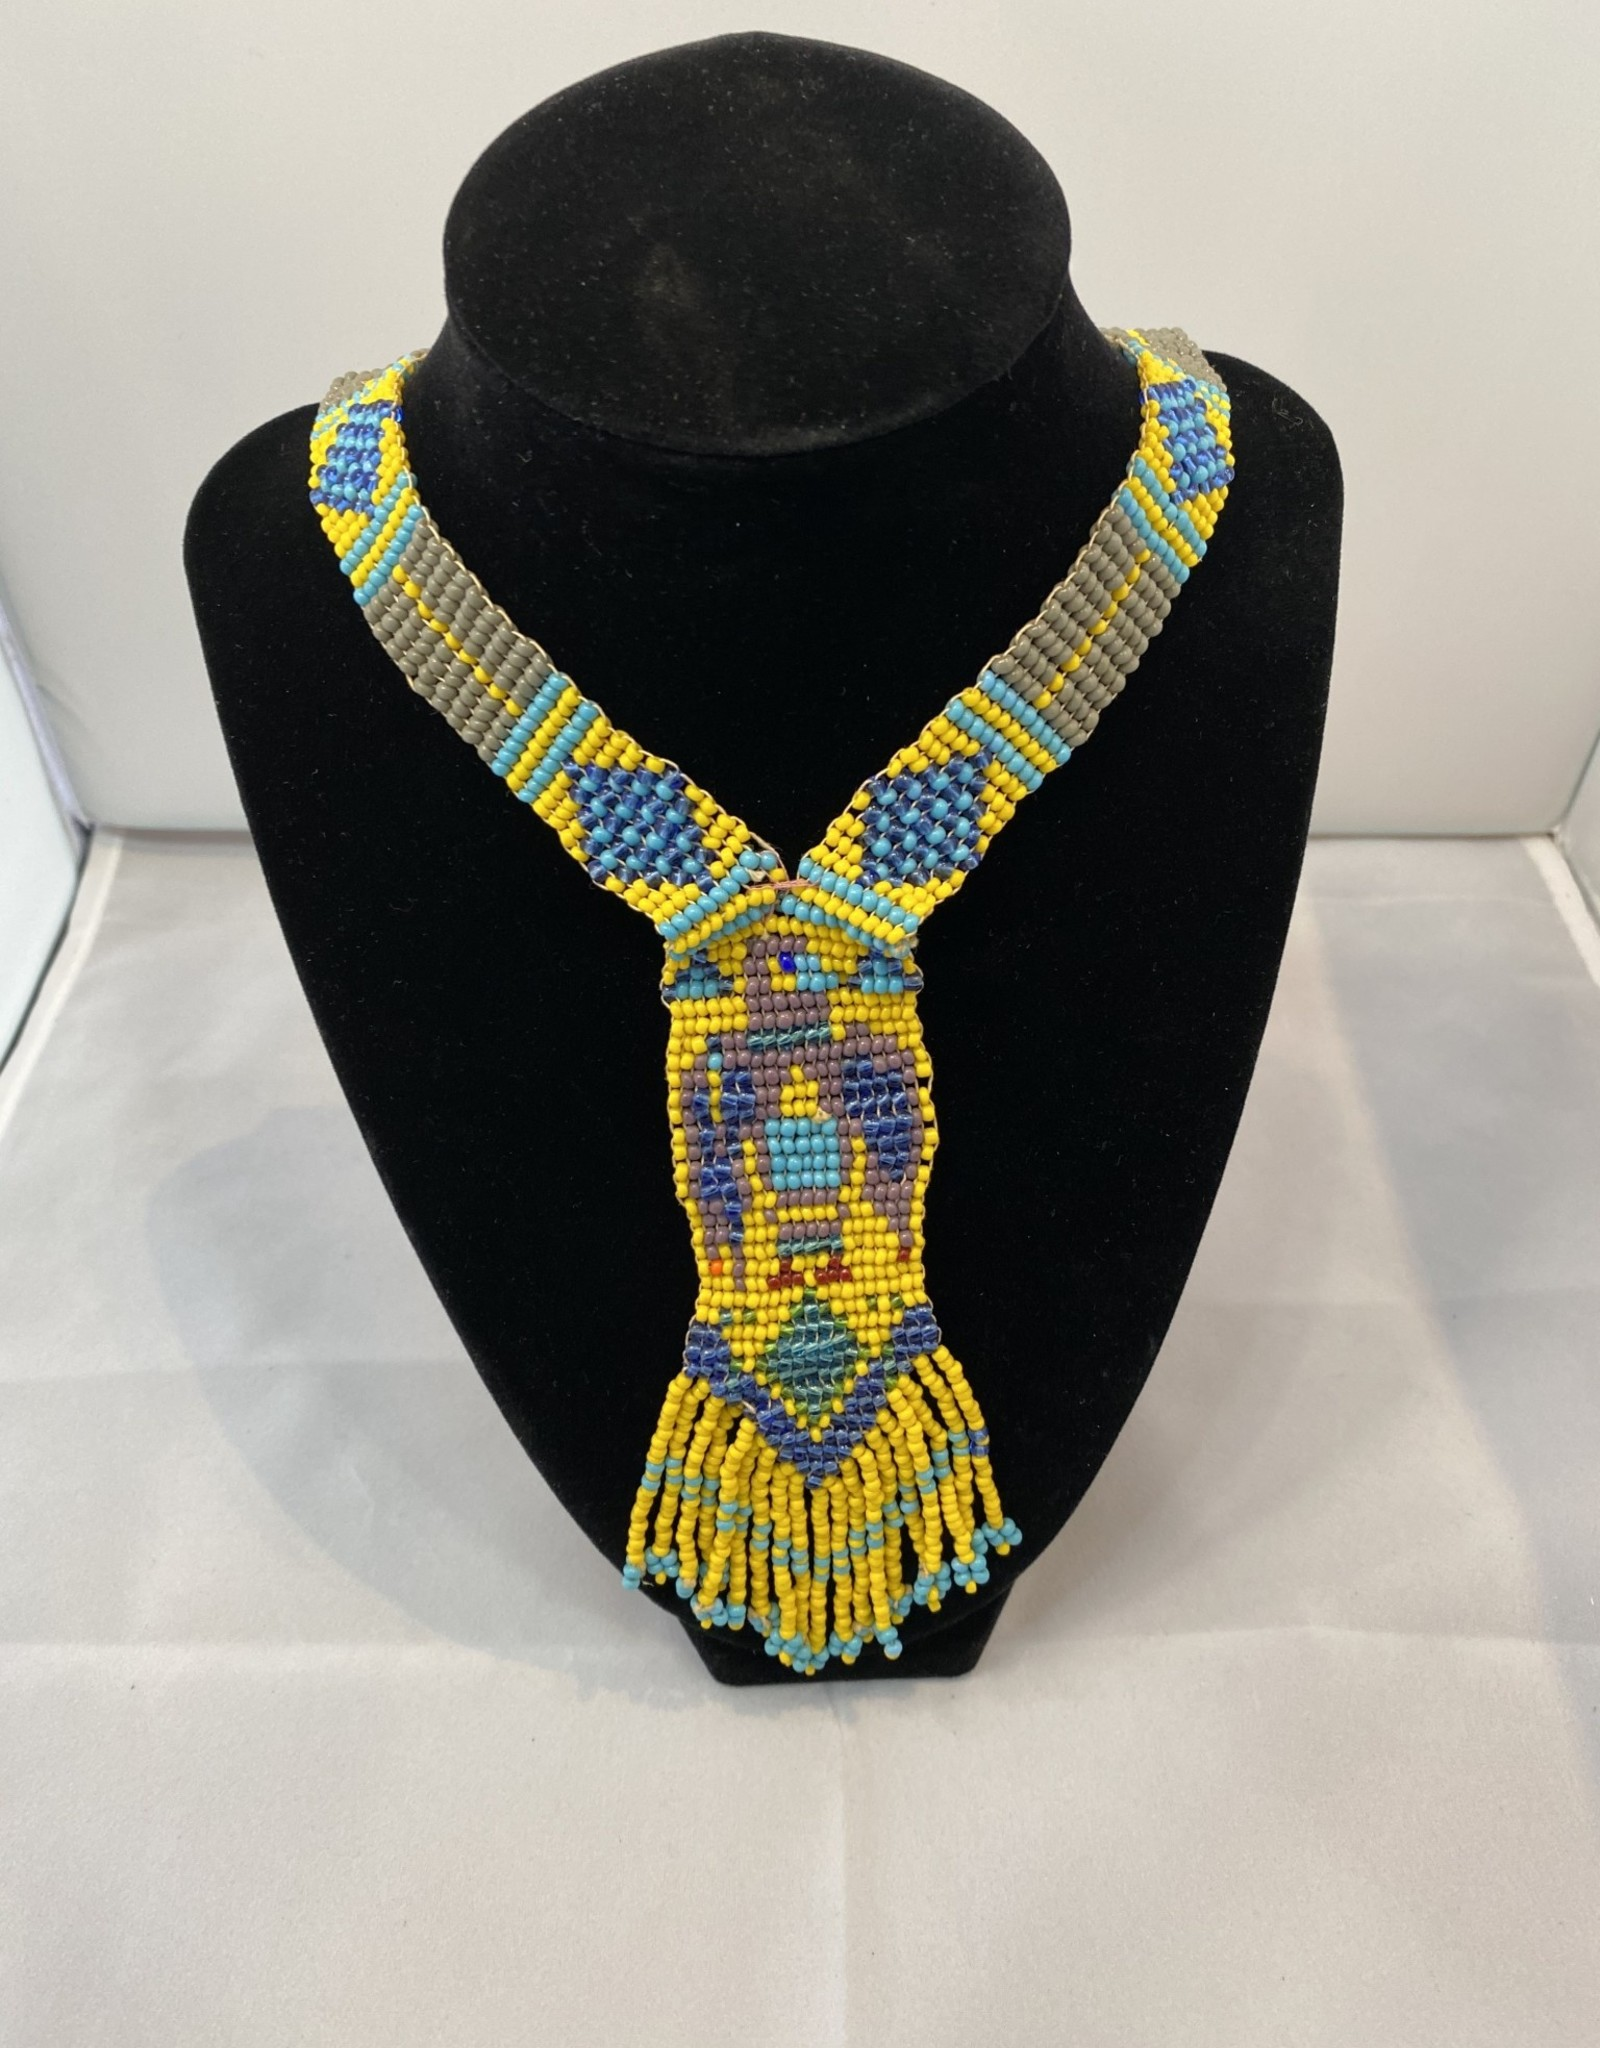 Jewelry - Native Badwork - Lumby